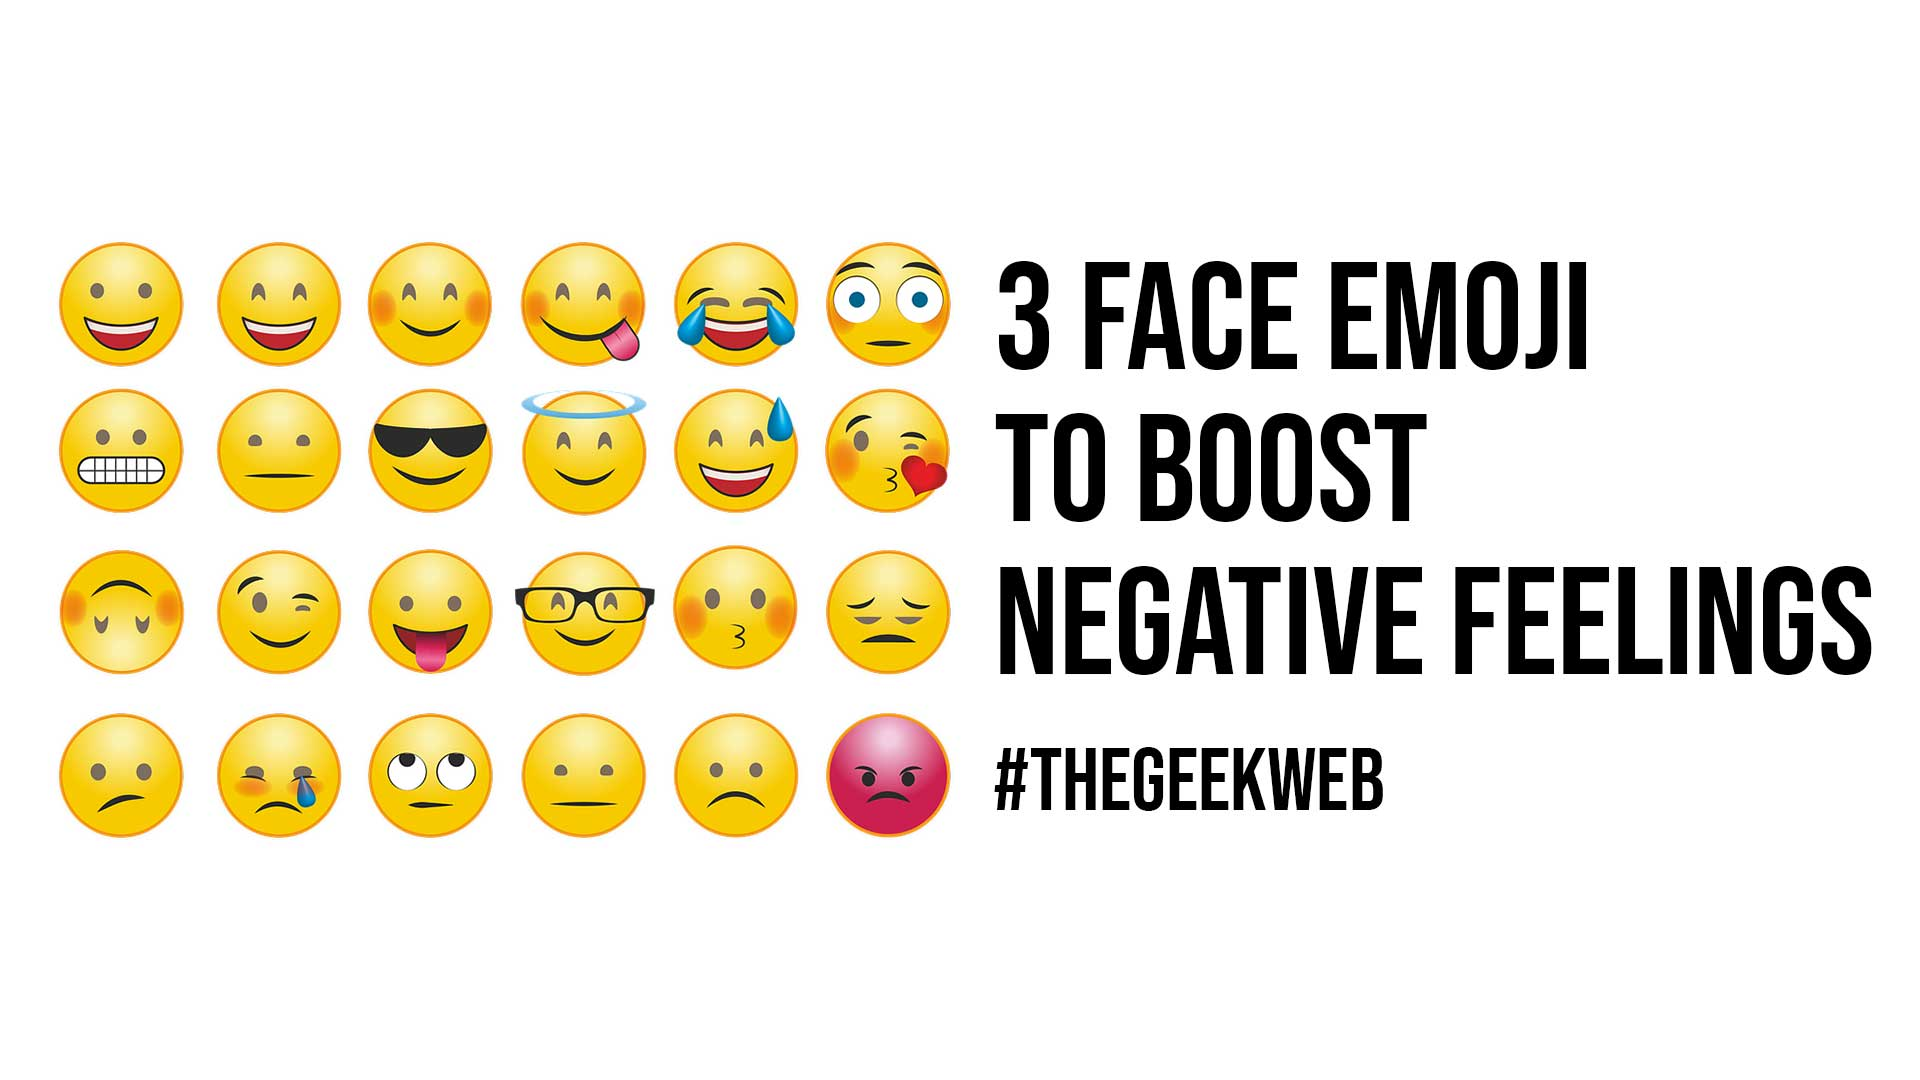 3 Face Emoji To Boost Negative Feelings